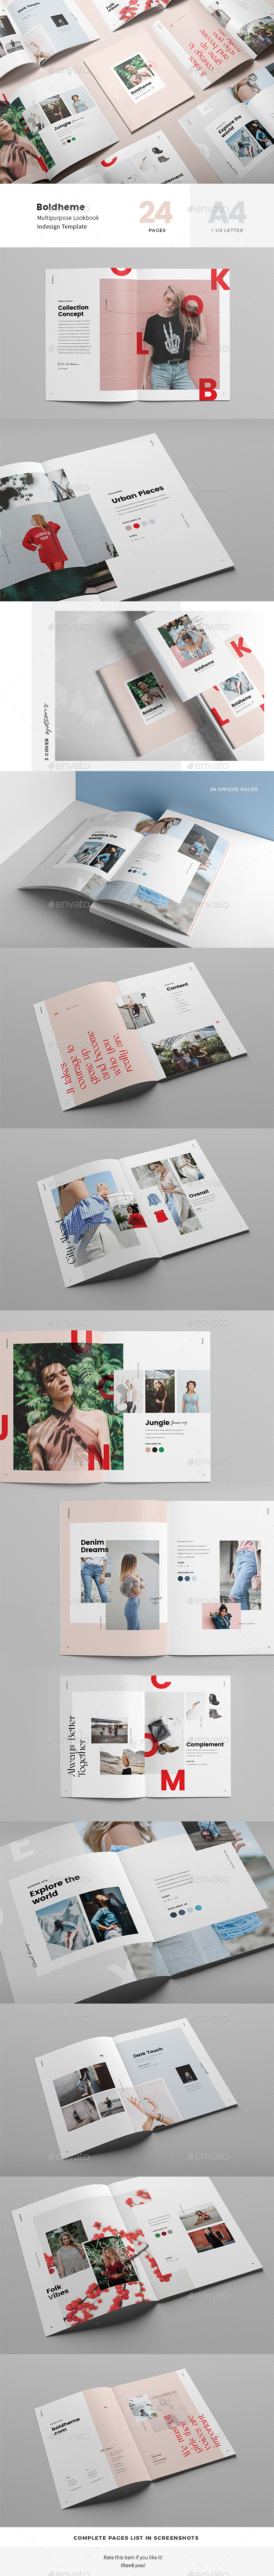 Boldheme / Lookbook & Catalog A4 + Letter - Magazines Print Templates